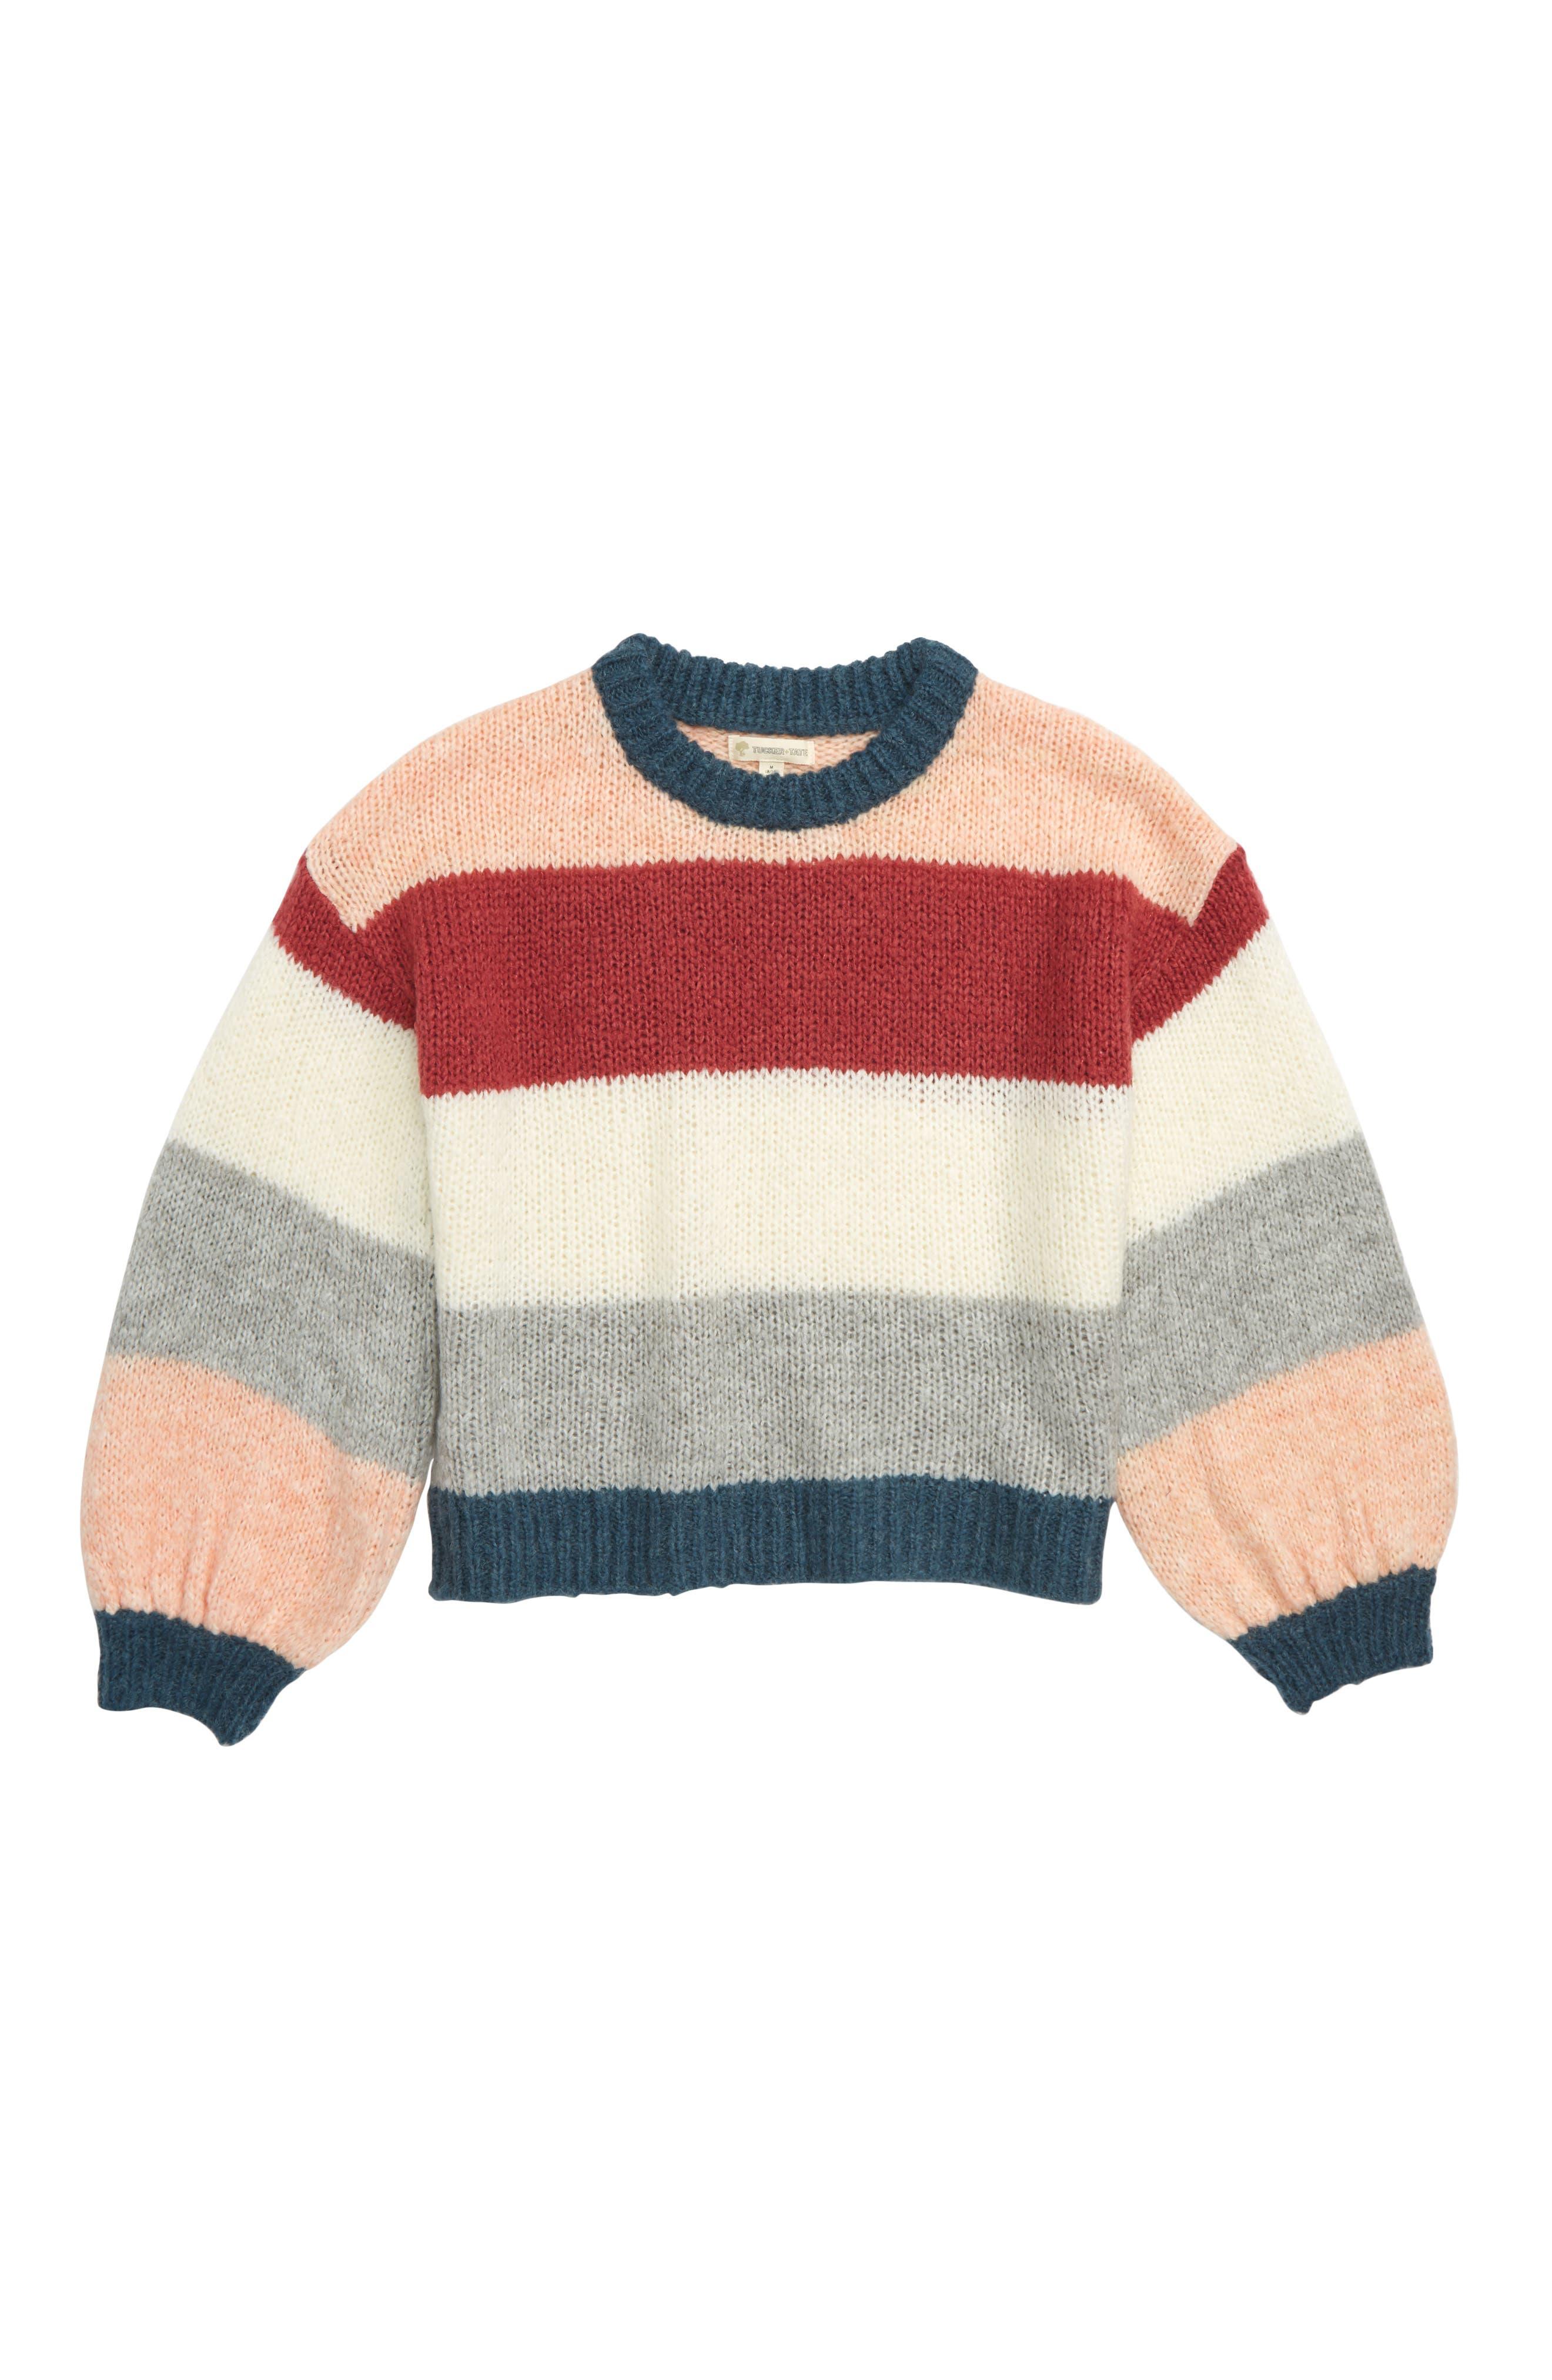 Colorblock Sweater, Main, color, PINK PEACHSKIN MULTI STRIPE